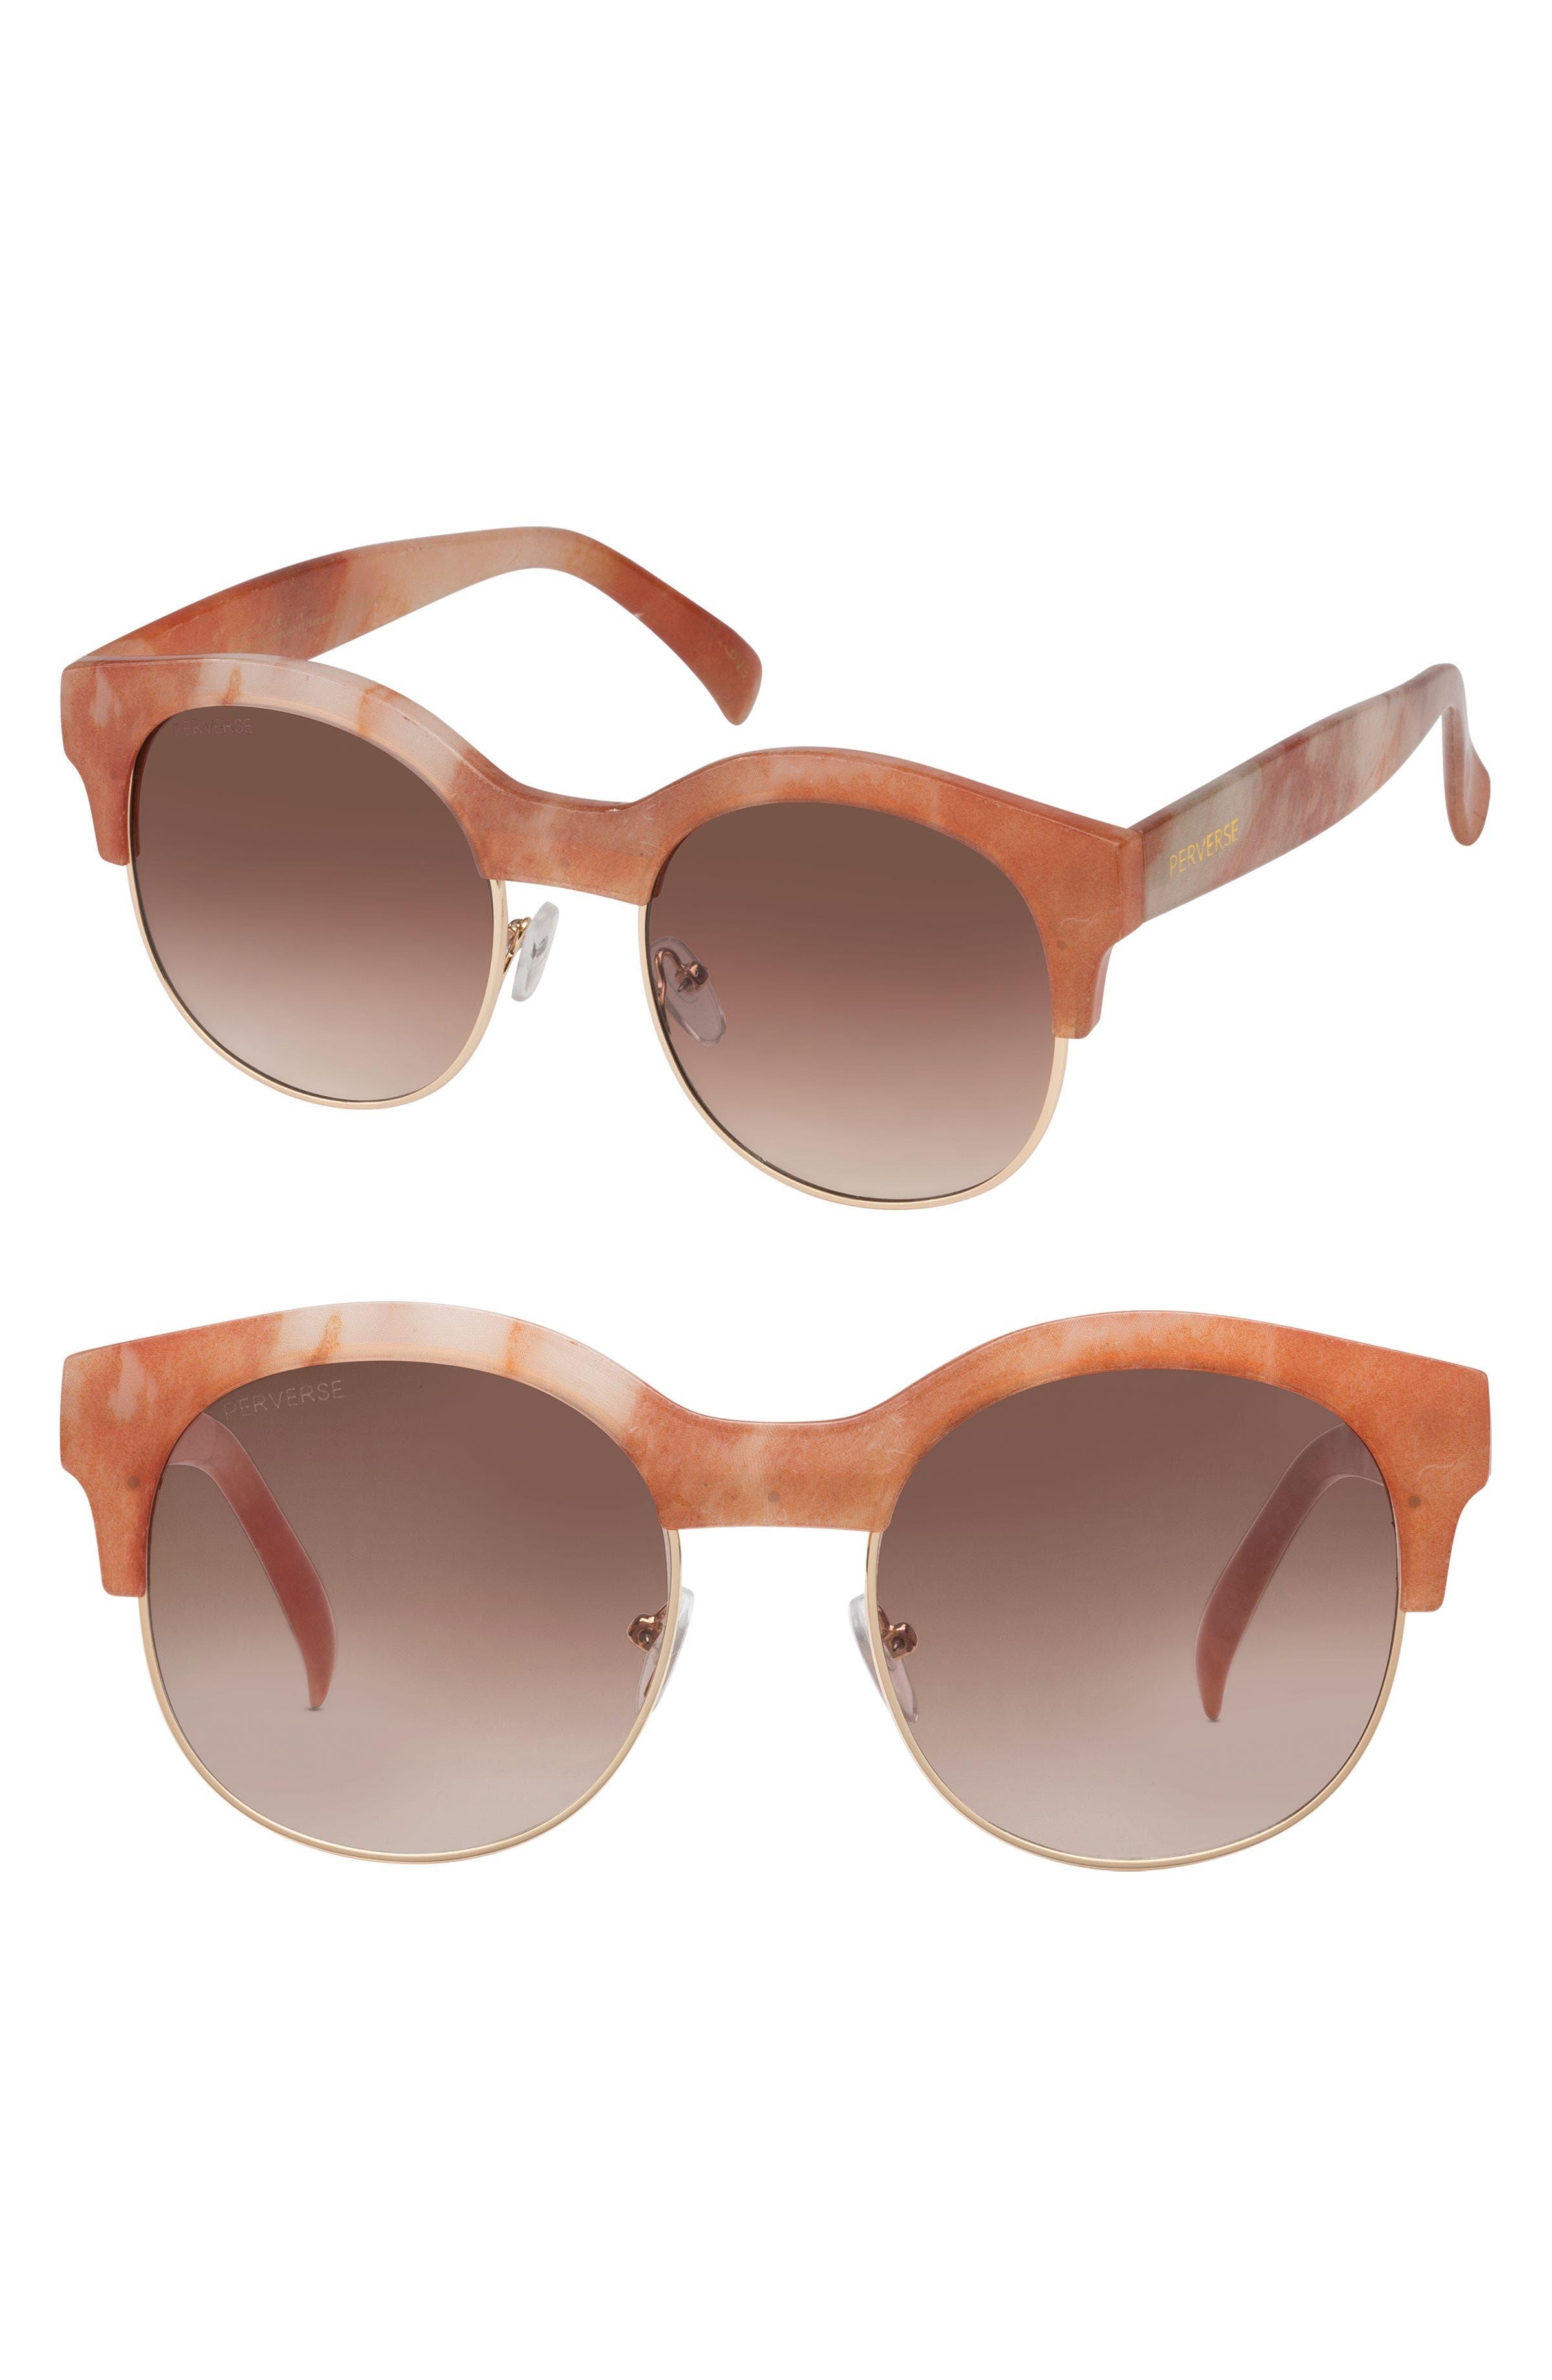 Greek 50mm Round Sunglasses,                         Main,                         color, 100